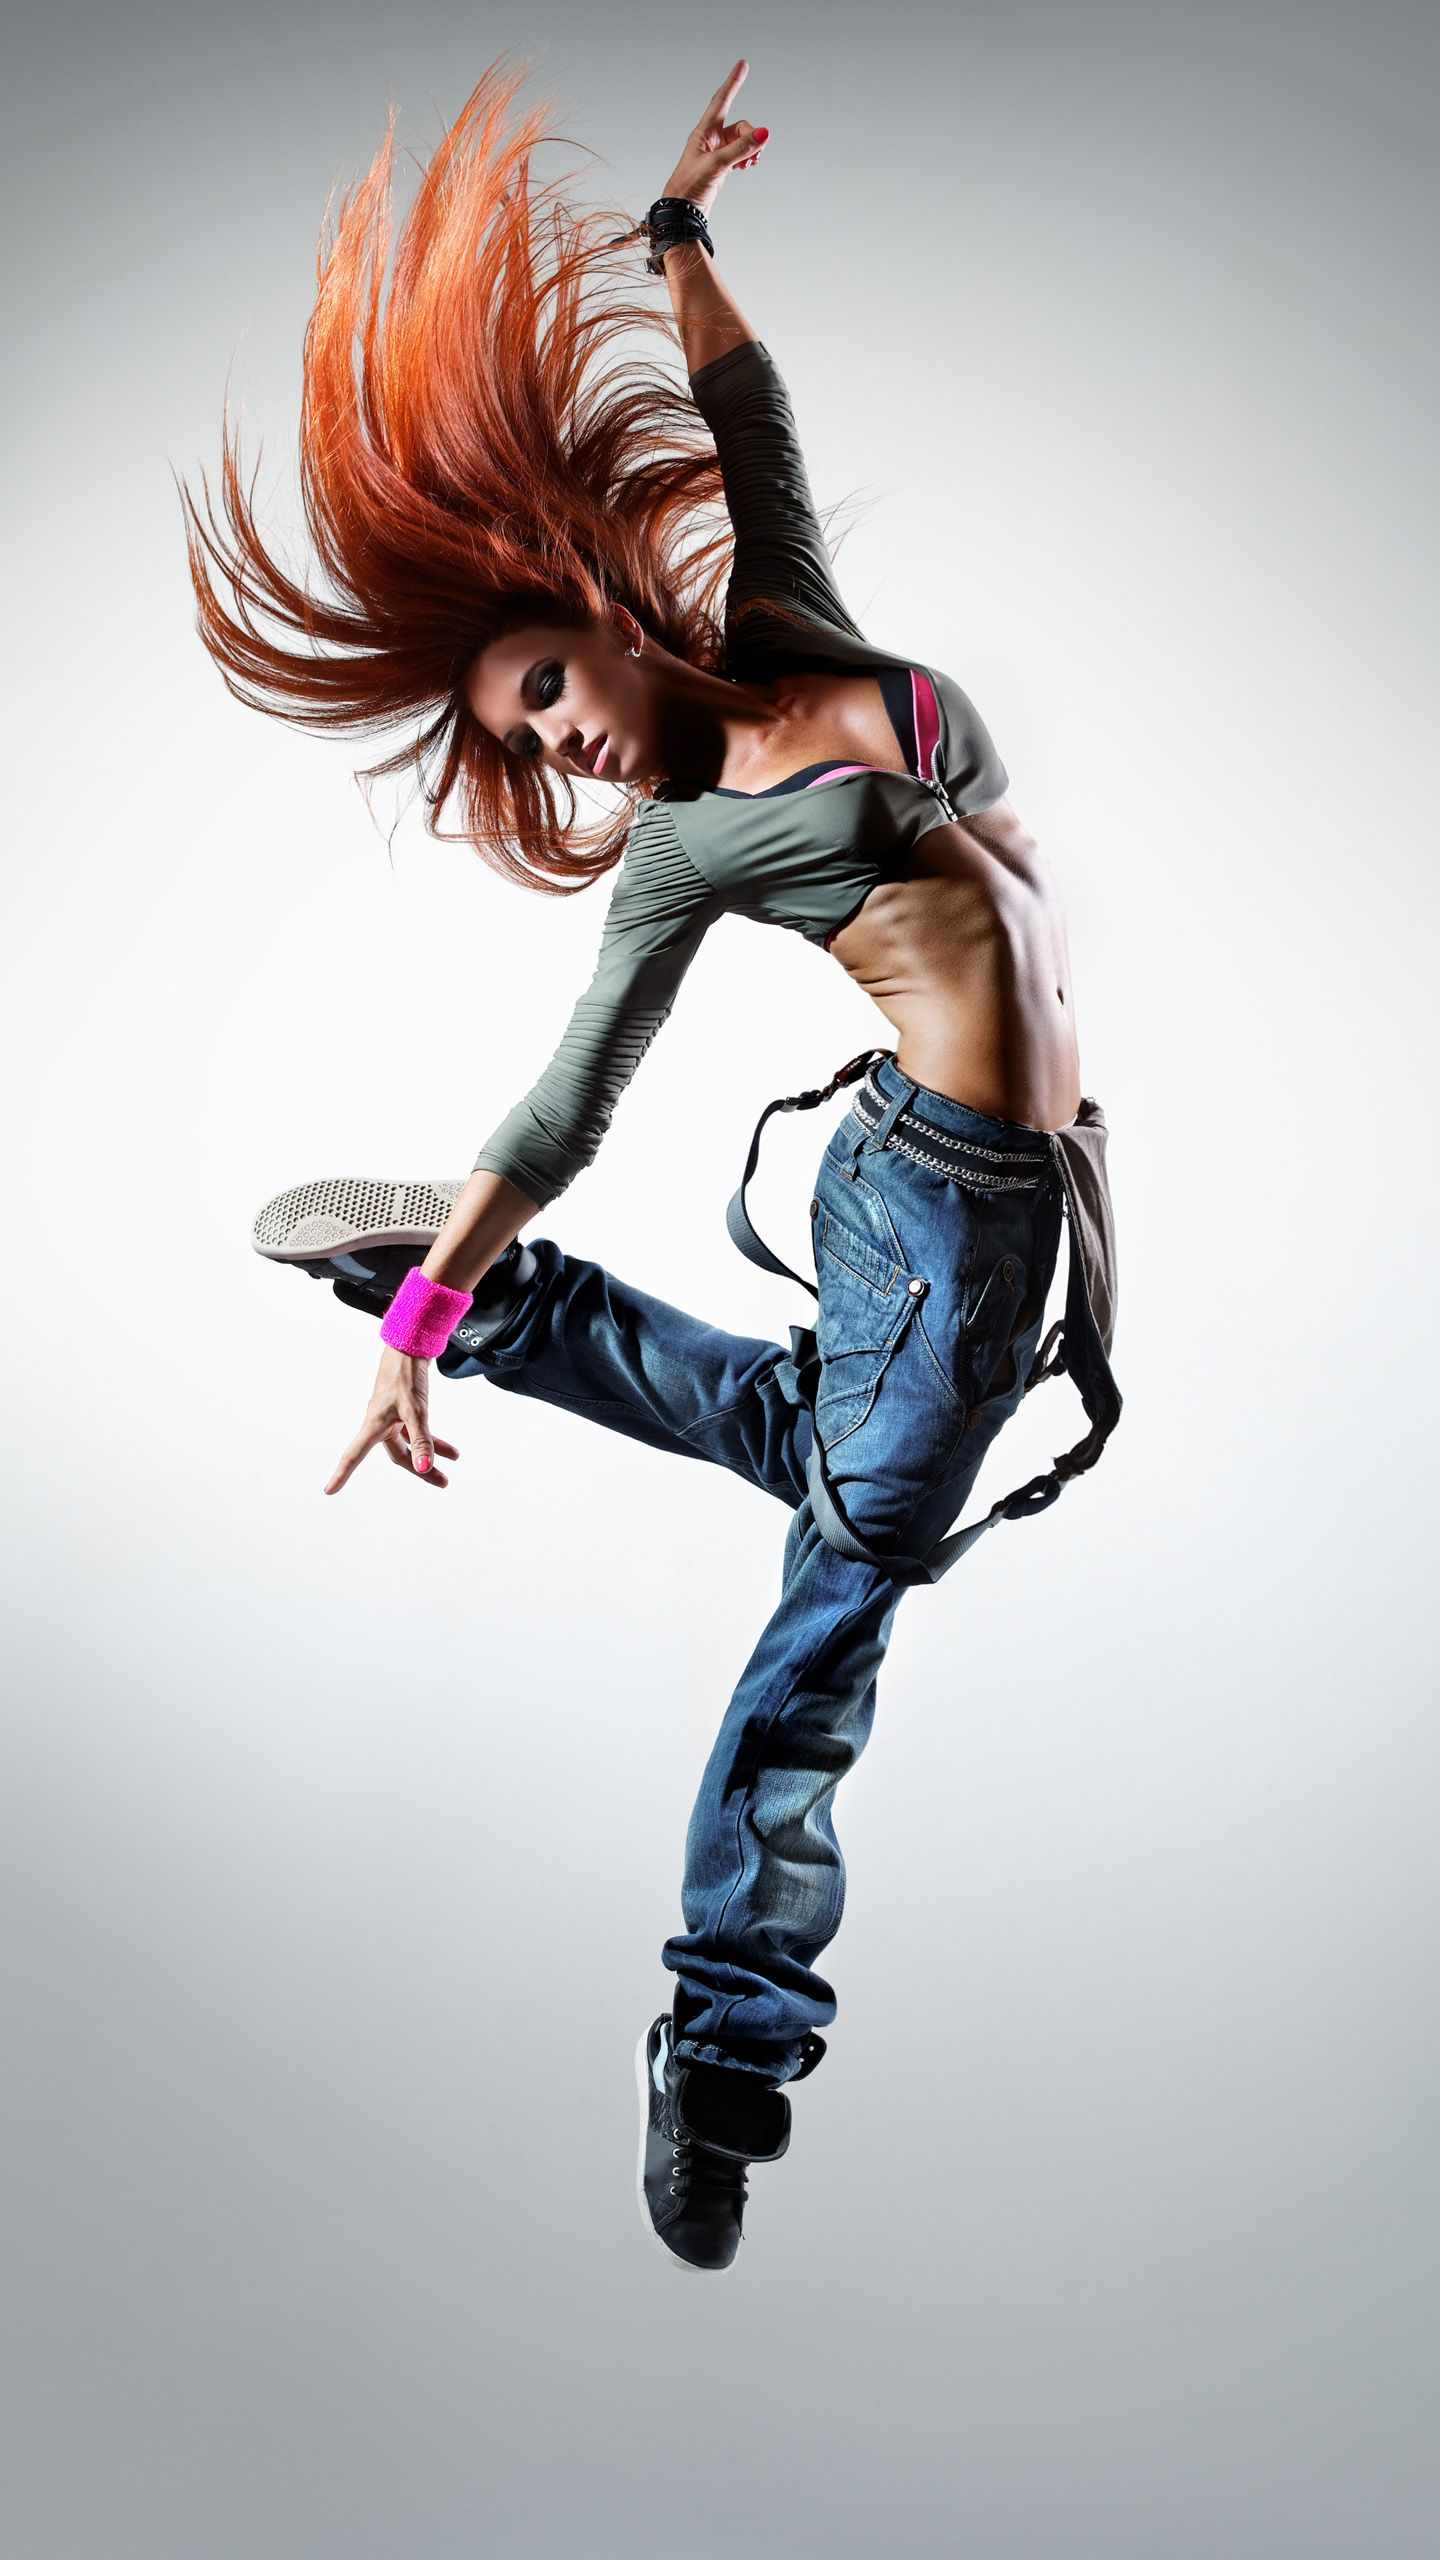 Hiphop fashion girl 1 Galaxy S6 Wallpaper Hip hop